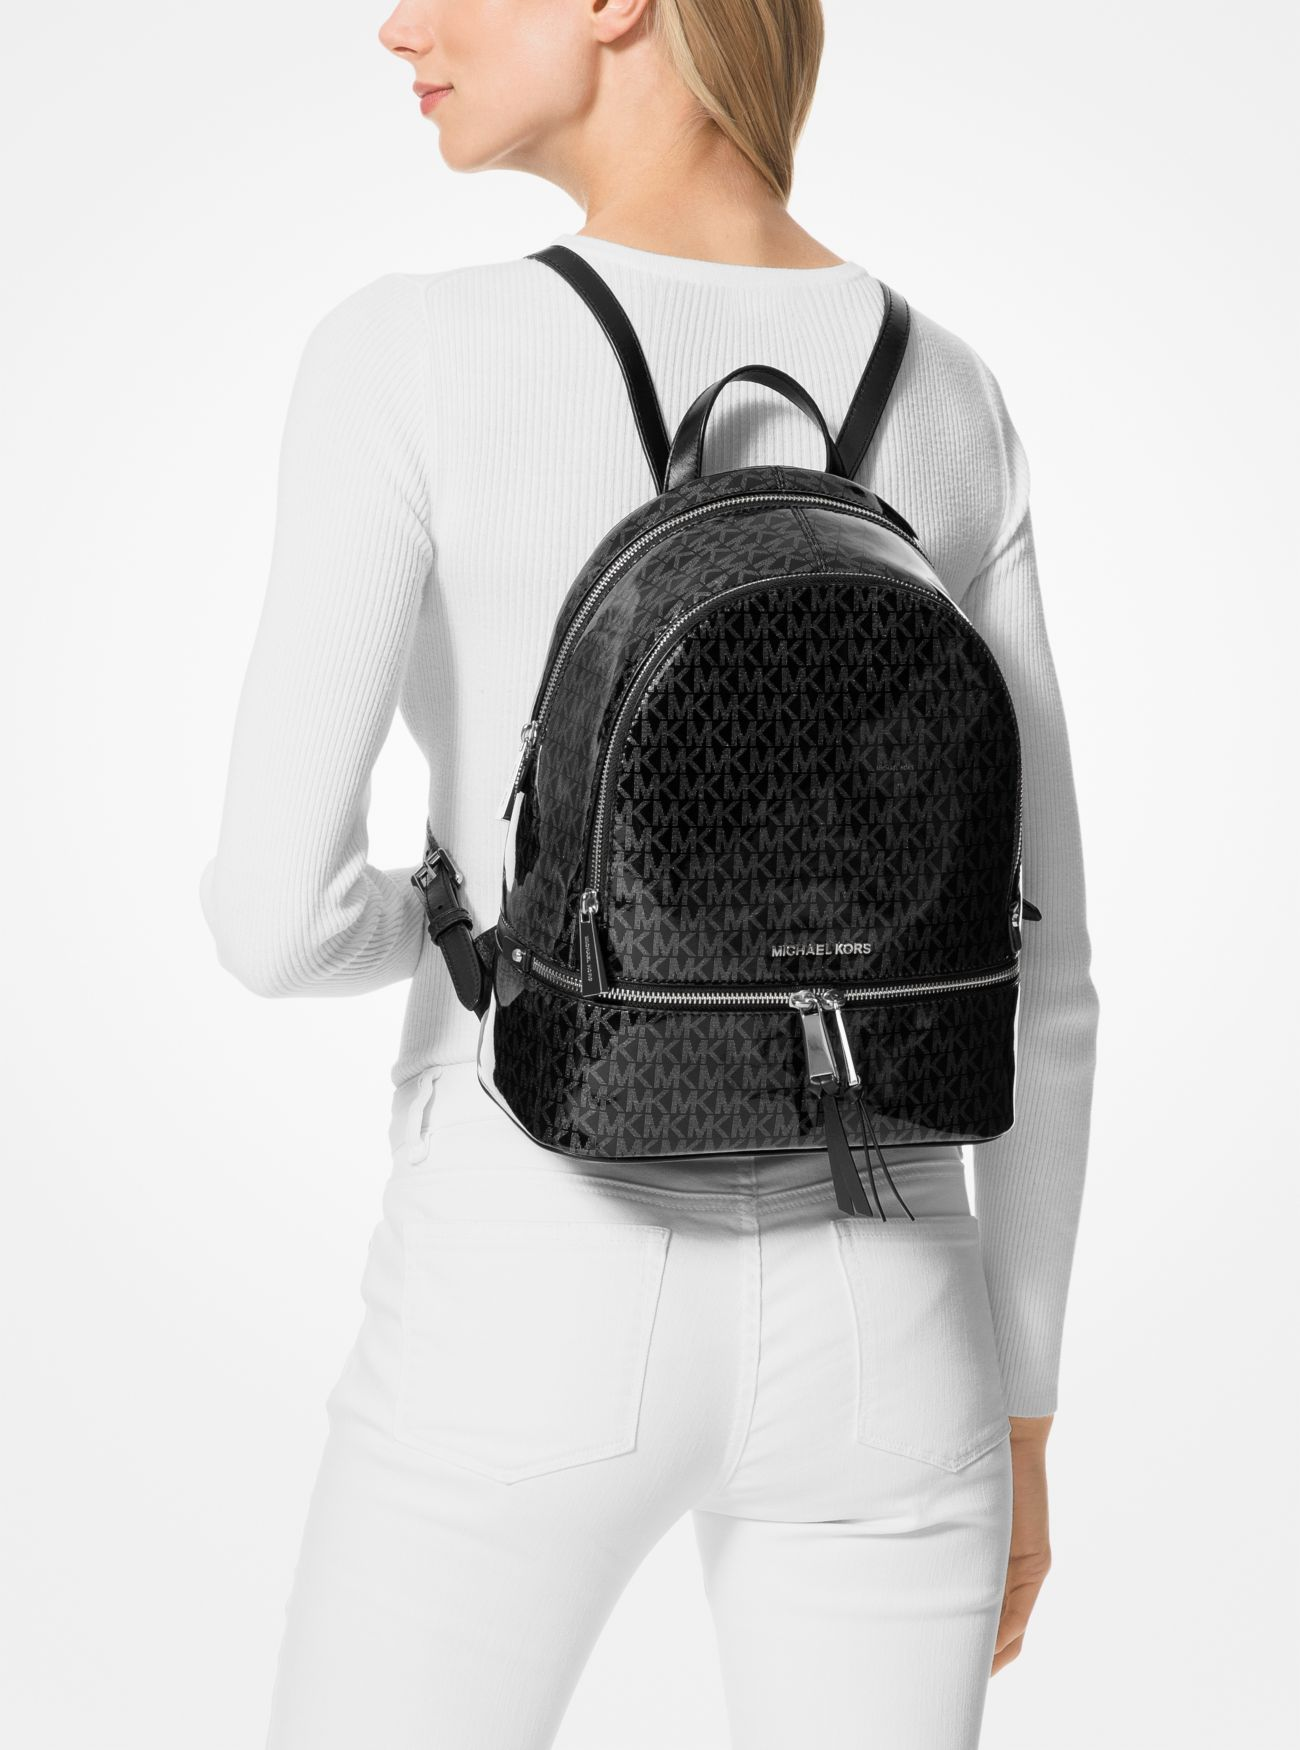 526f71061514 MICHAEL KORS Rhea Medium Glossy Signature Backpack in 2019